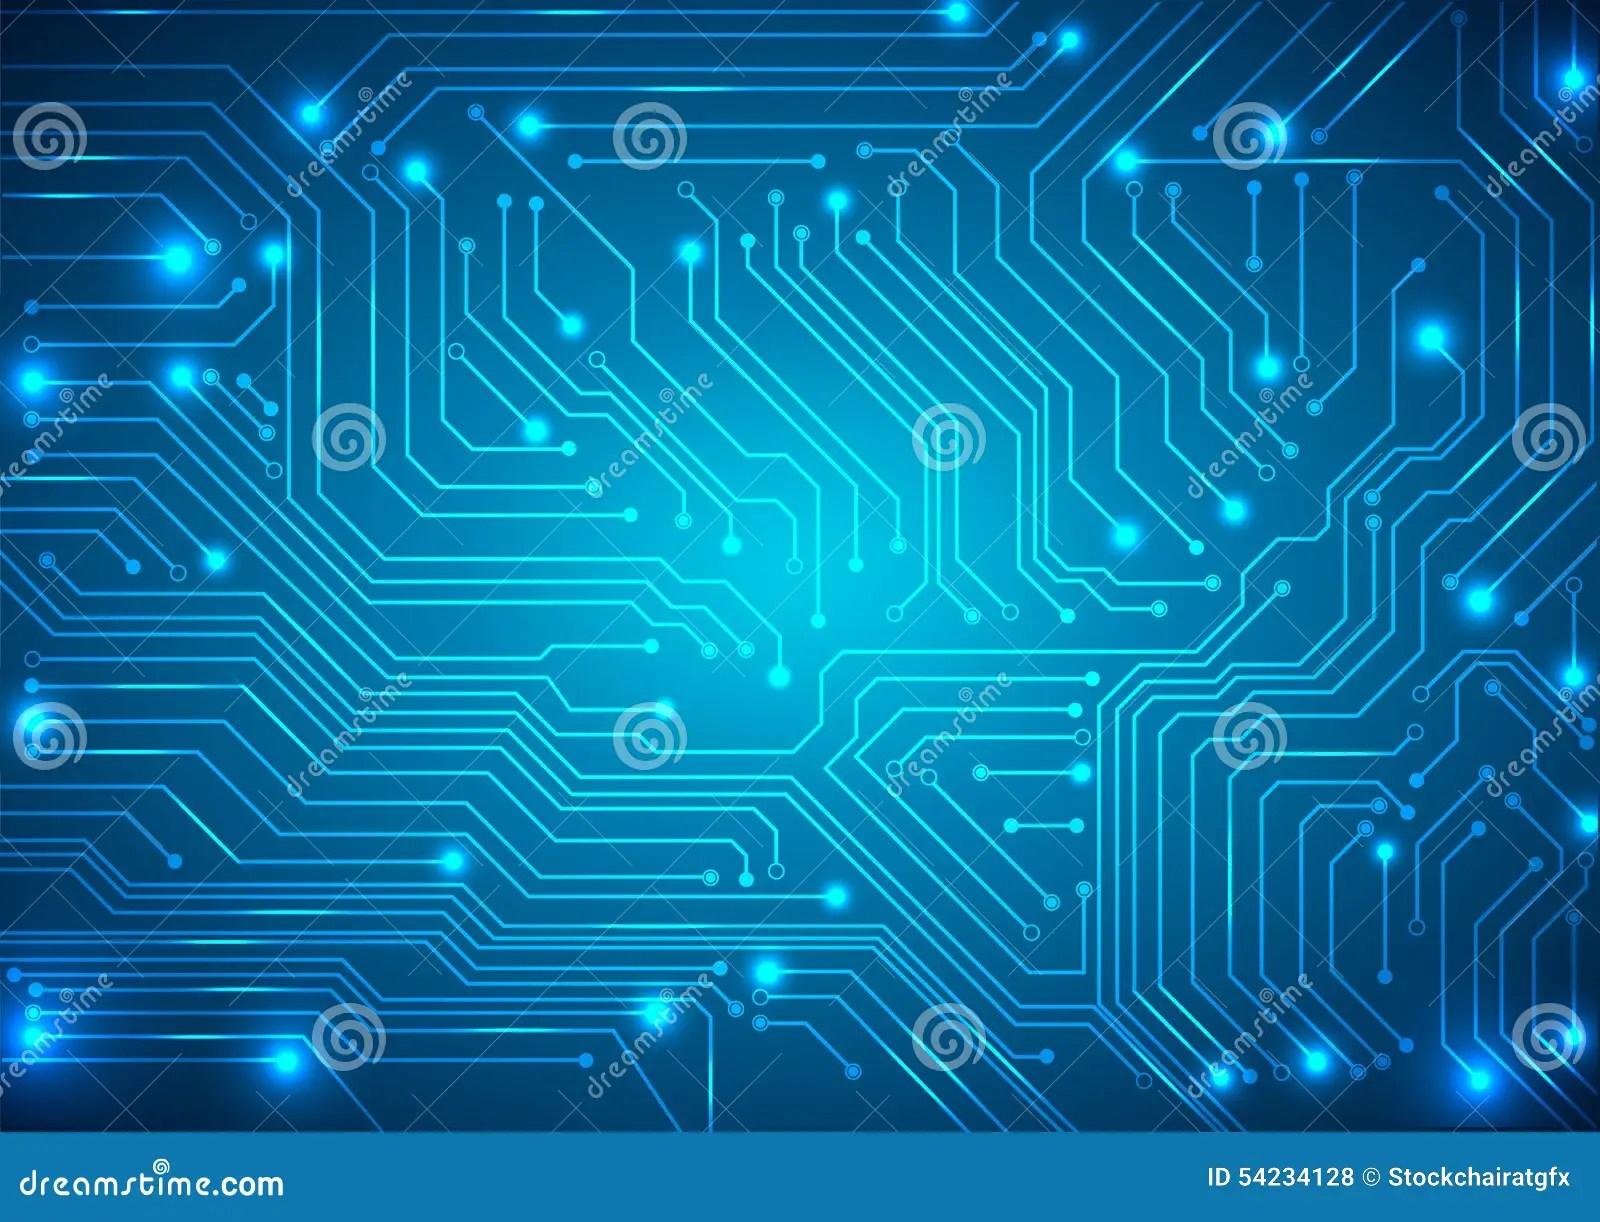 Motherboard Wallpaper 3d 与高科技电路板的抽象传染媒介背景 向量例证 图片 54234128